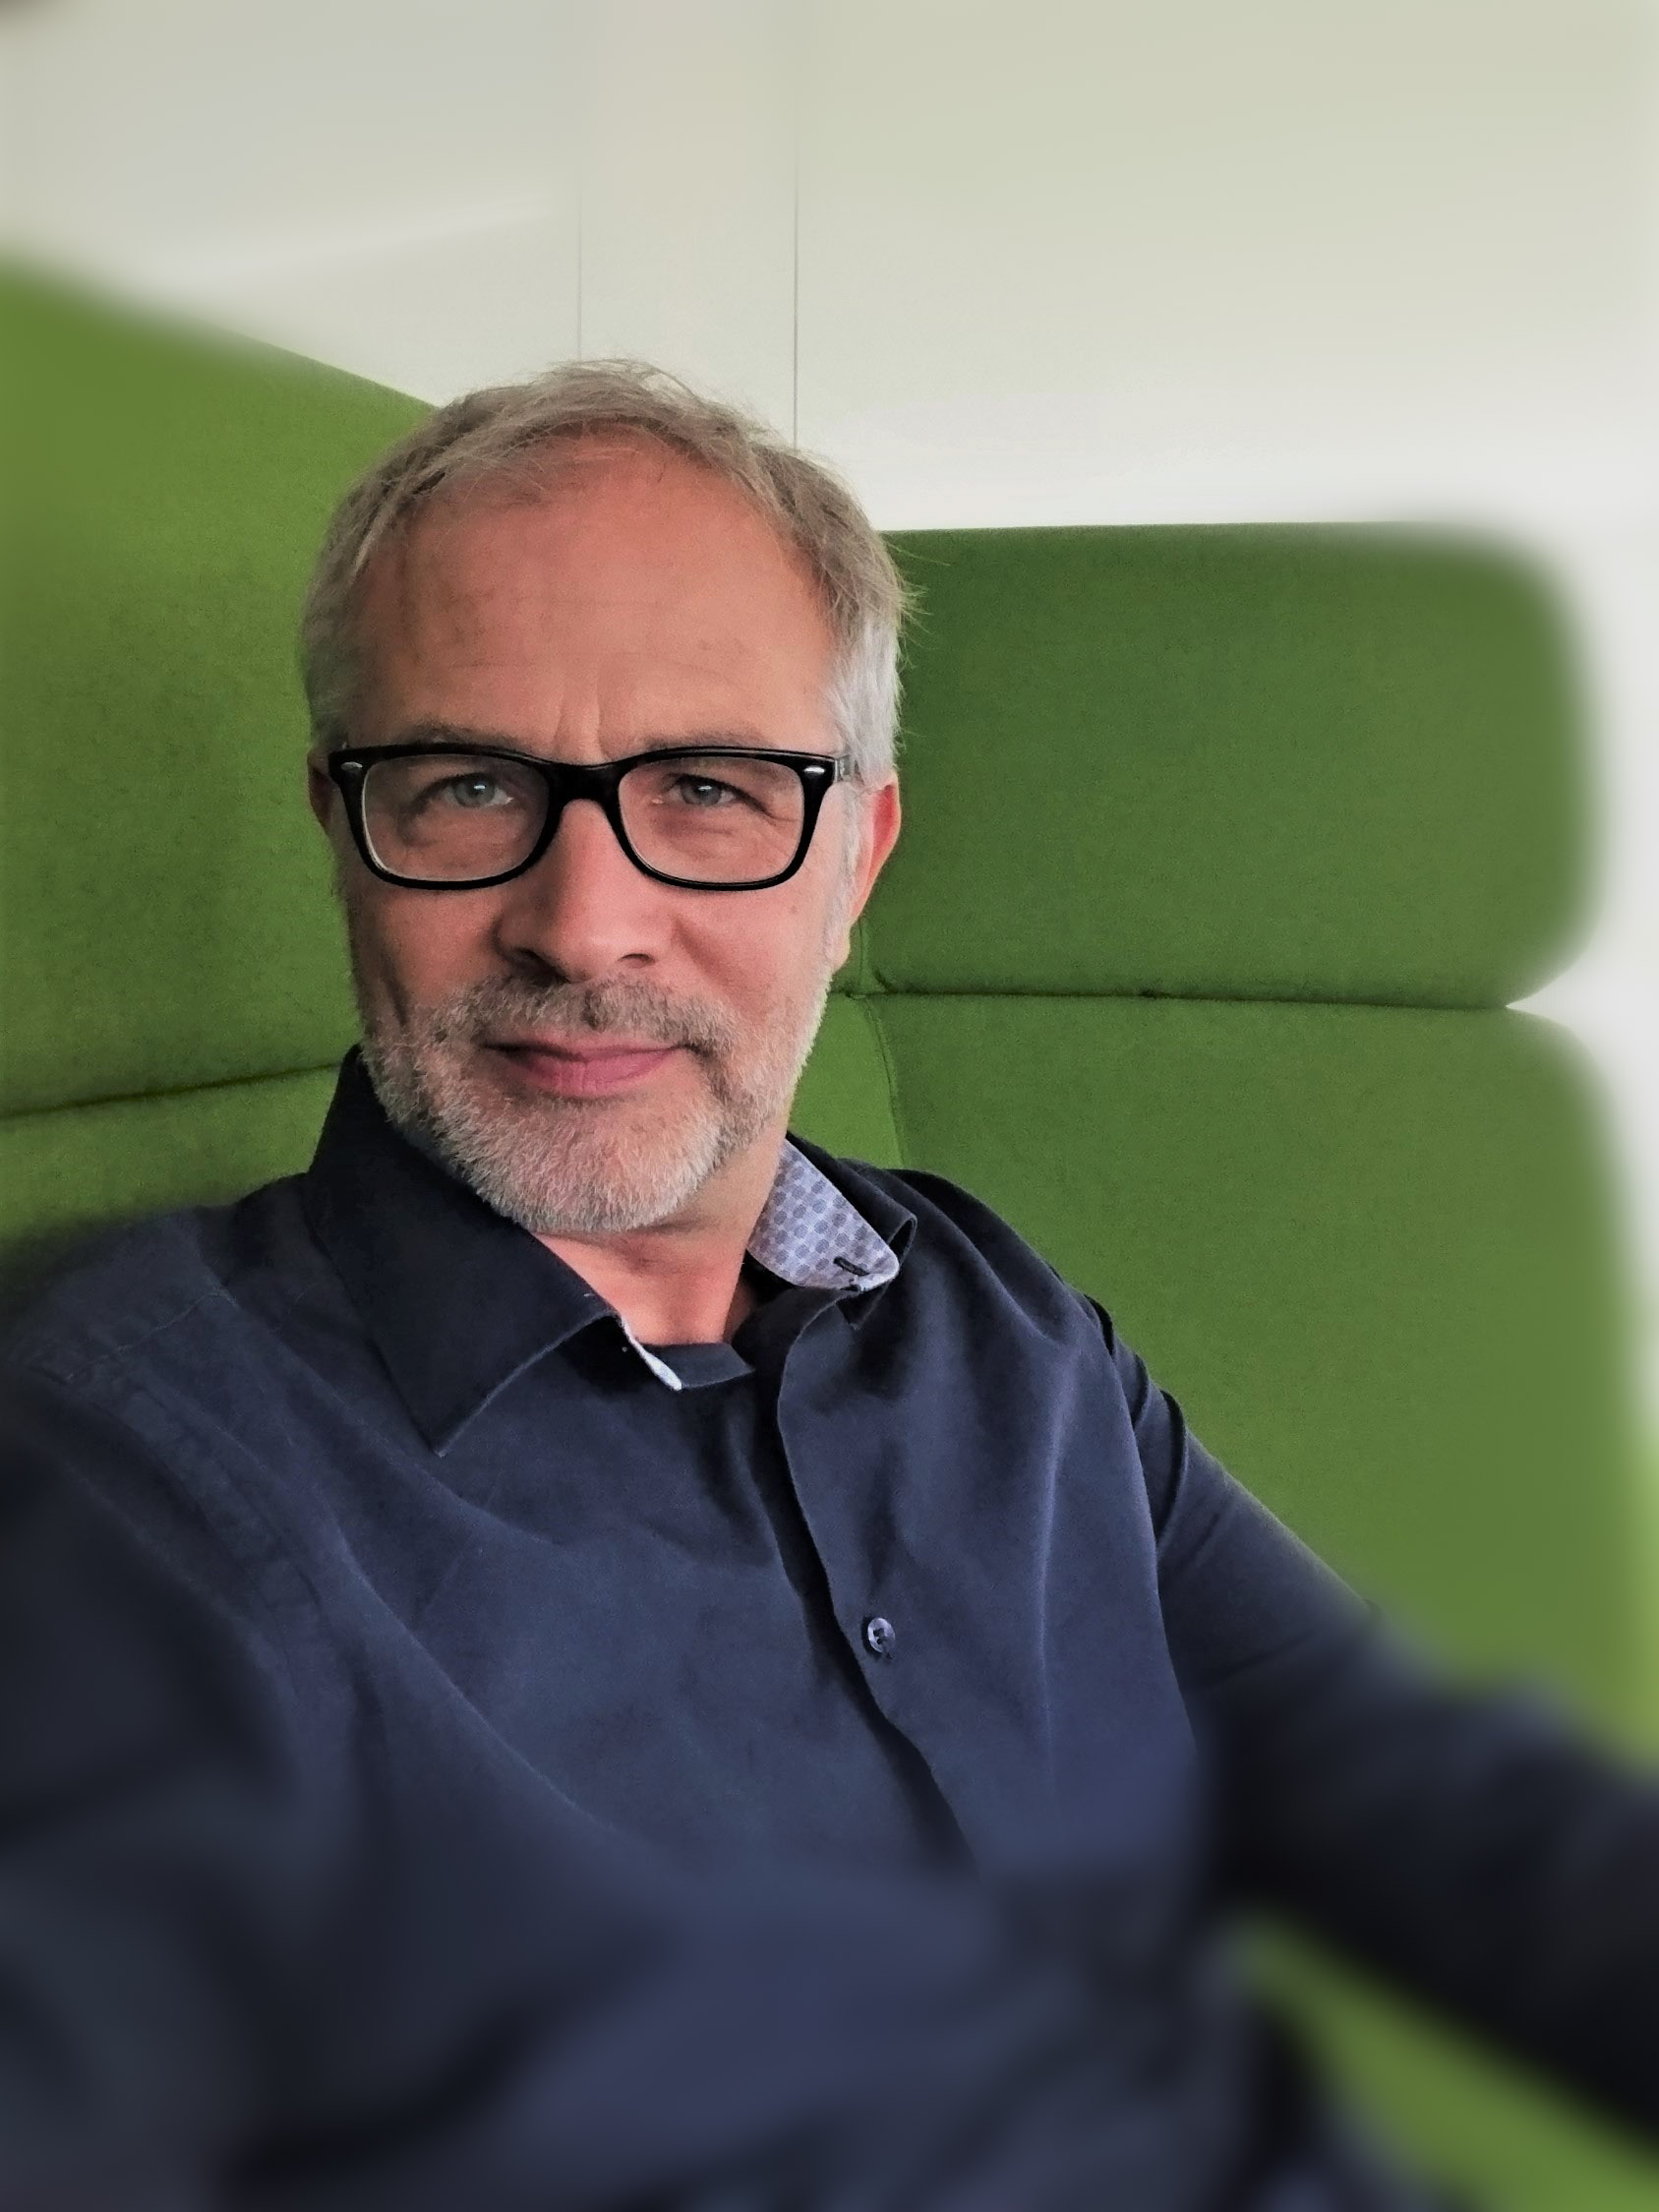 Matthias Rist Allton